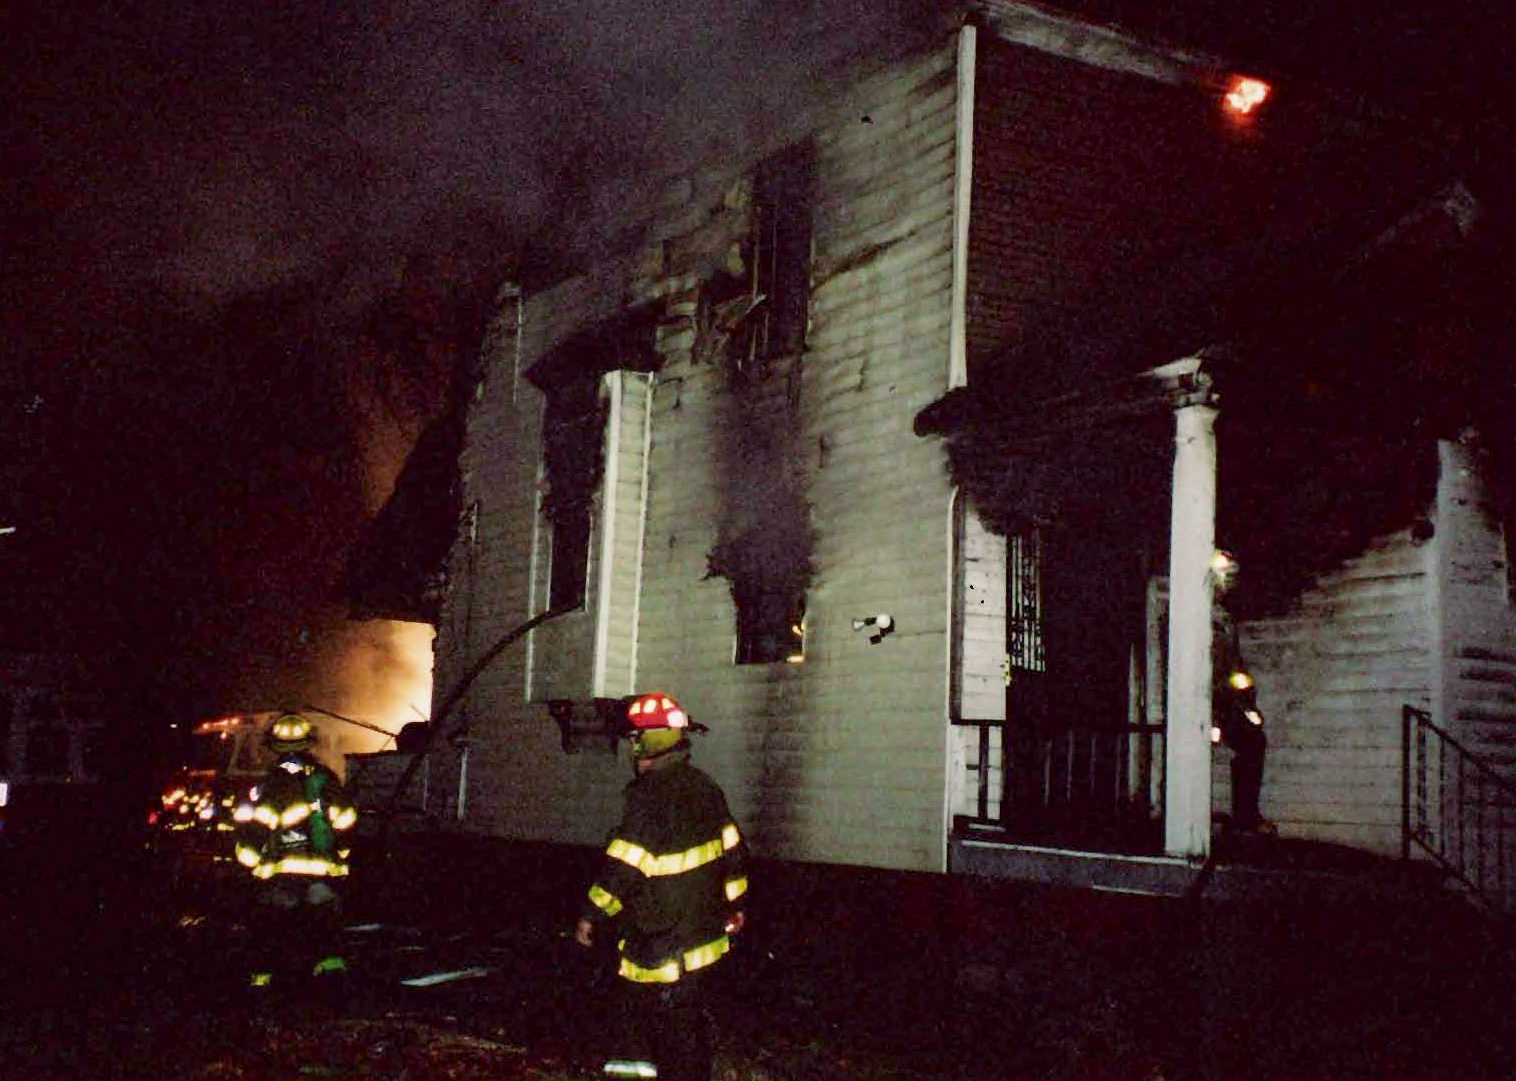 Angela-Garcia-ohio-arson-firefighters-1488384901